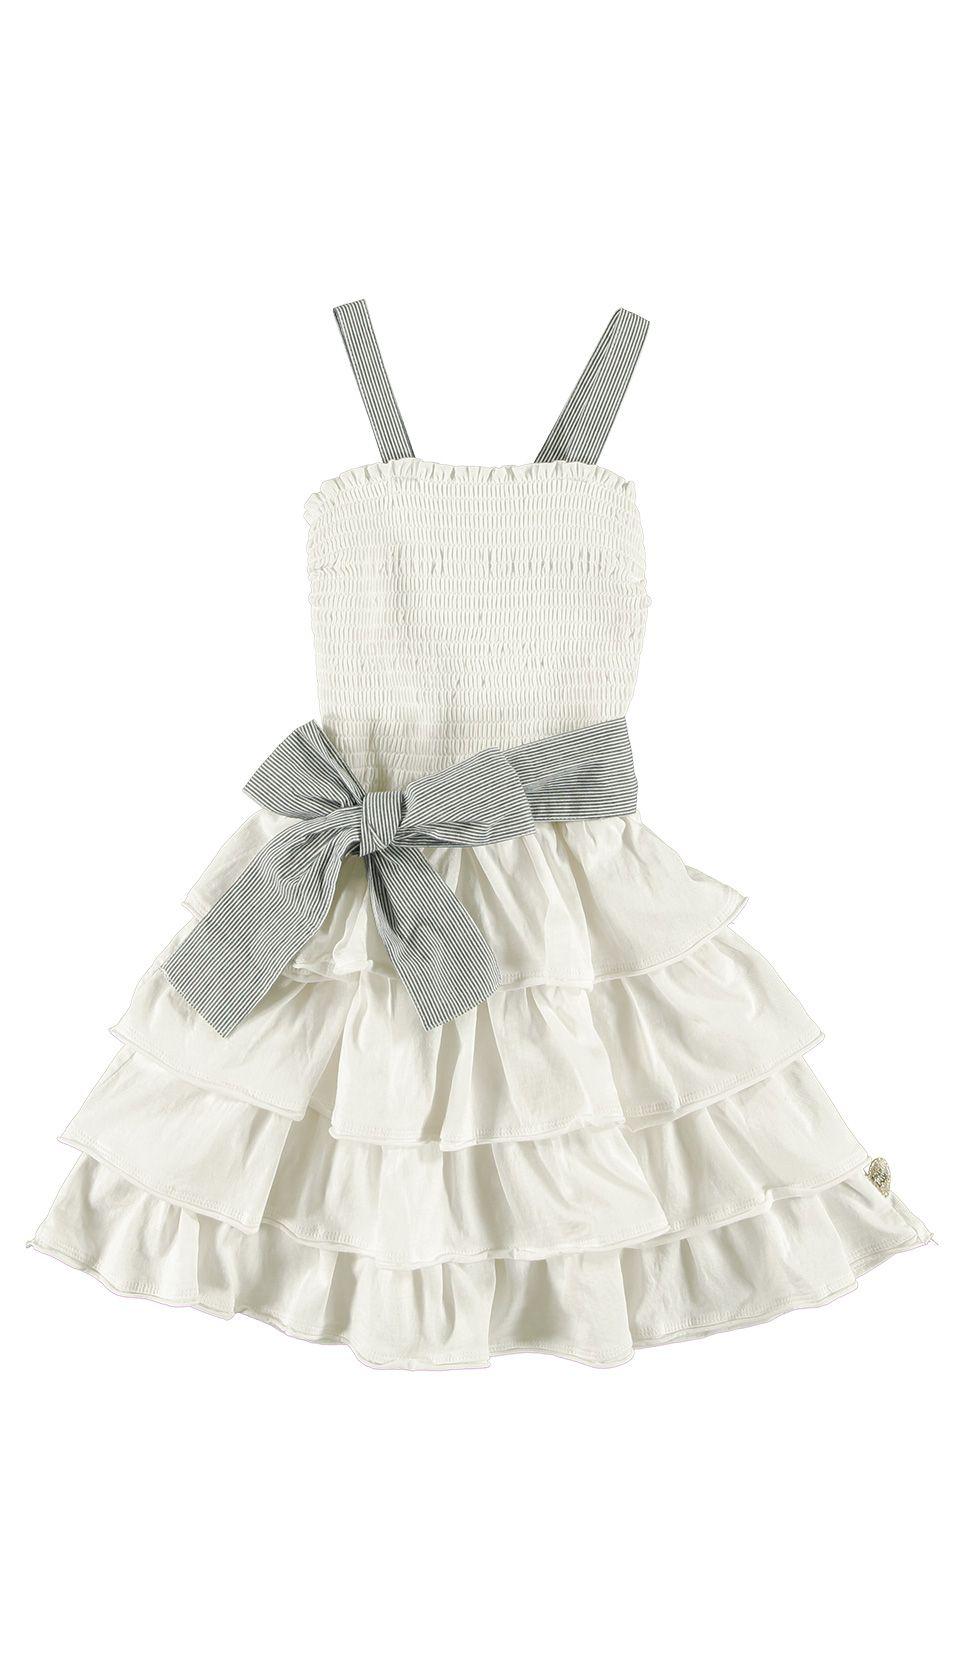 Pompdelux cool clothes for kids prom dresses pinterest